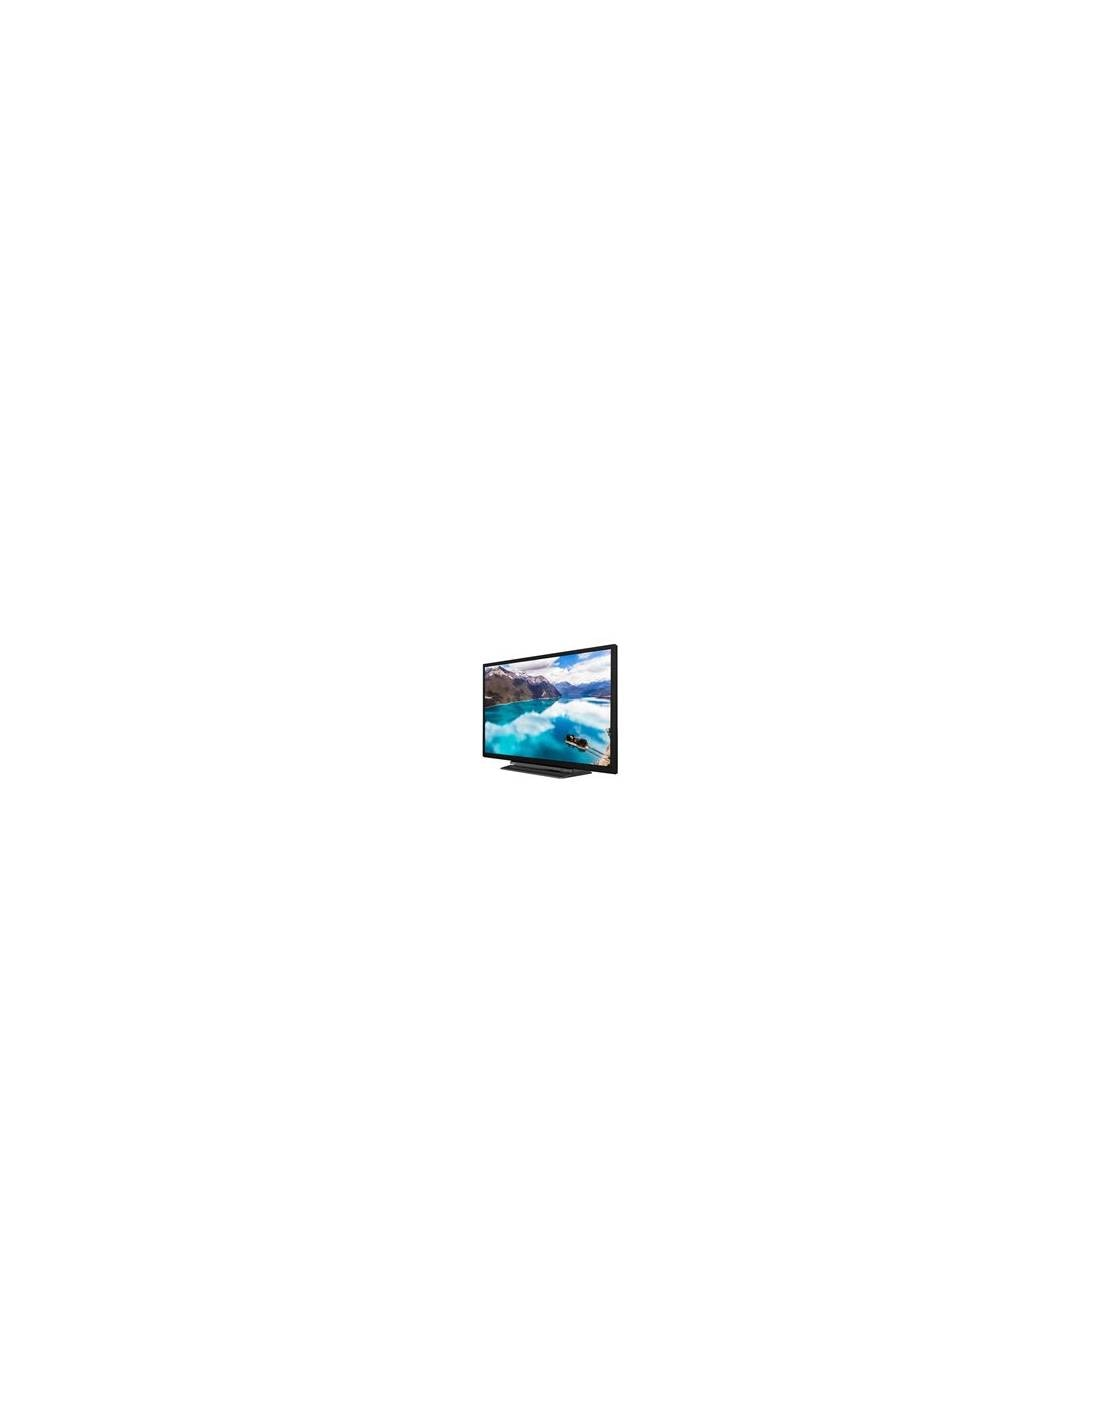 "Toshiba 32ll3a63dg-32 ""classe ll3 série tv led-smart tv-1080p (hd completo) 1920x1080-d-led backlight"